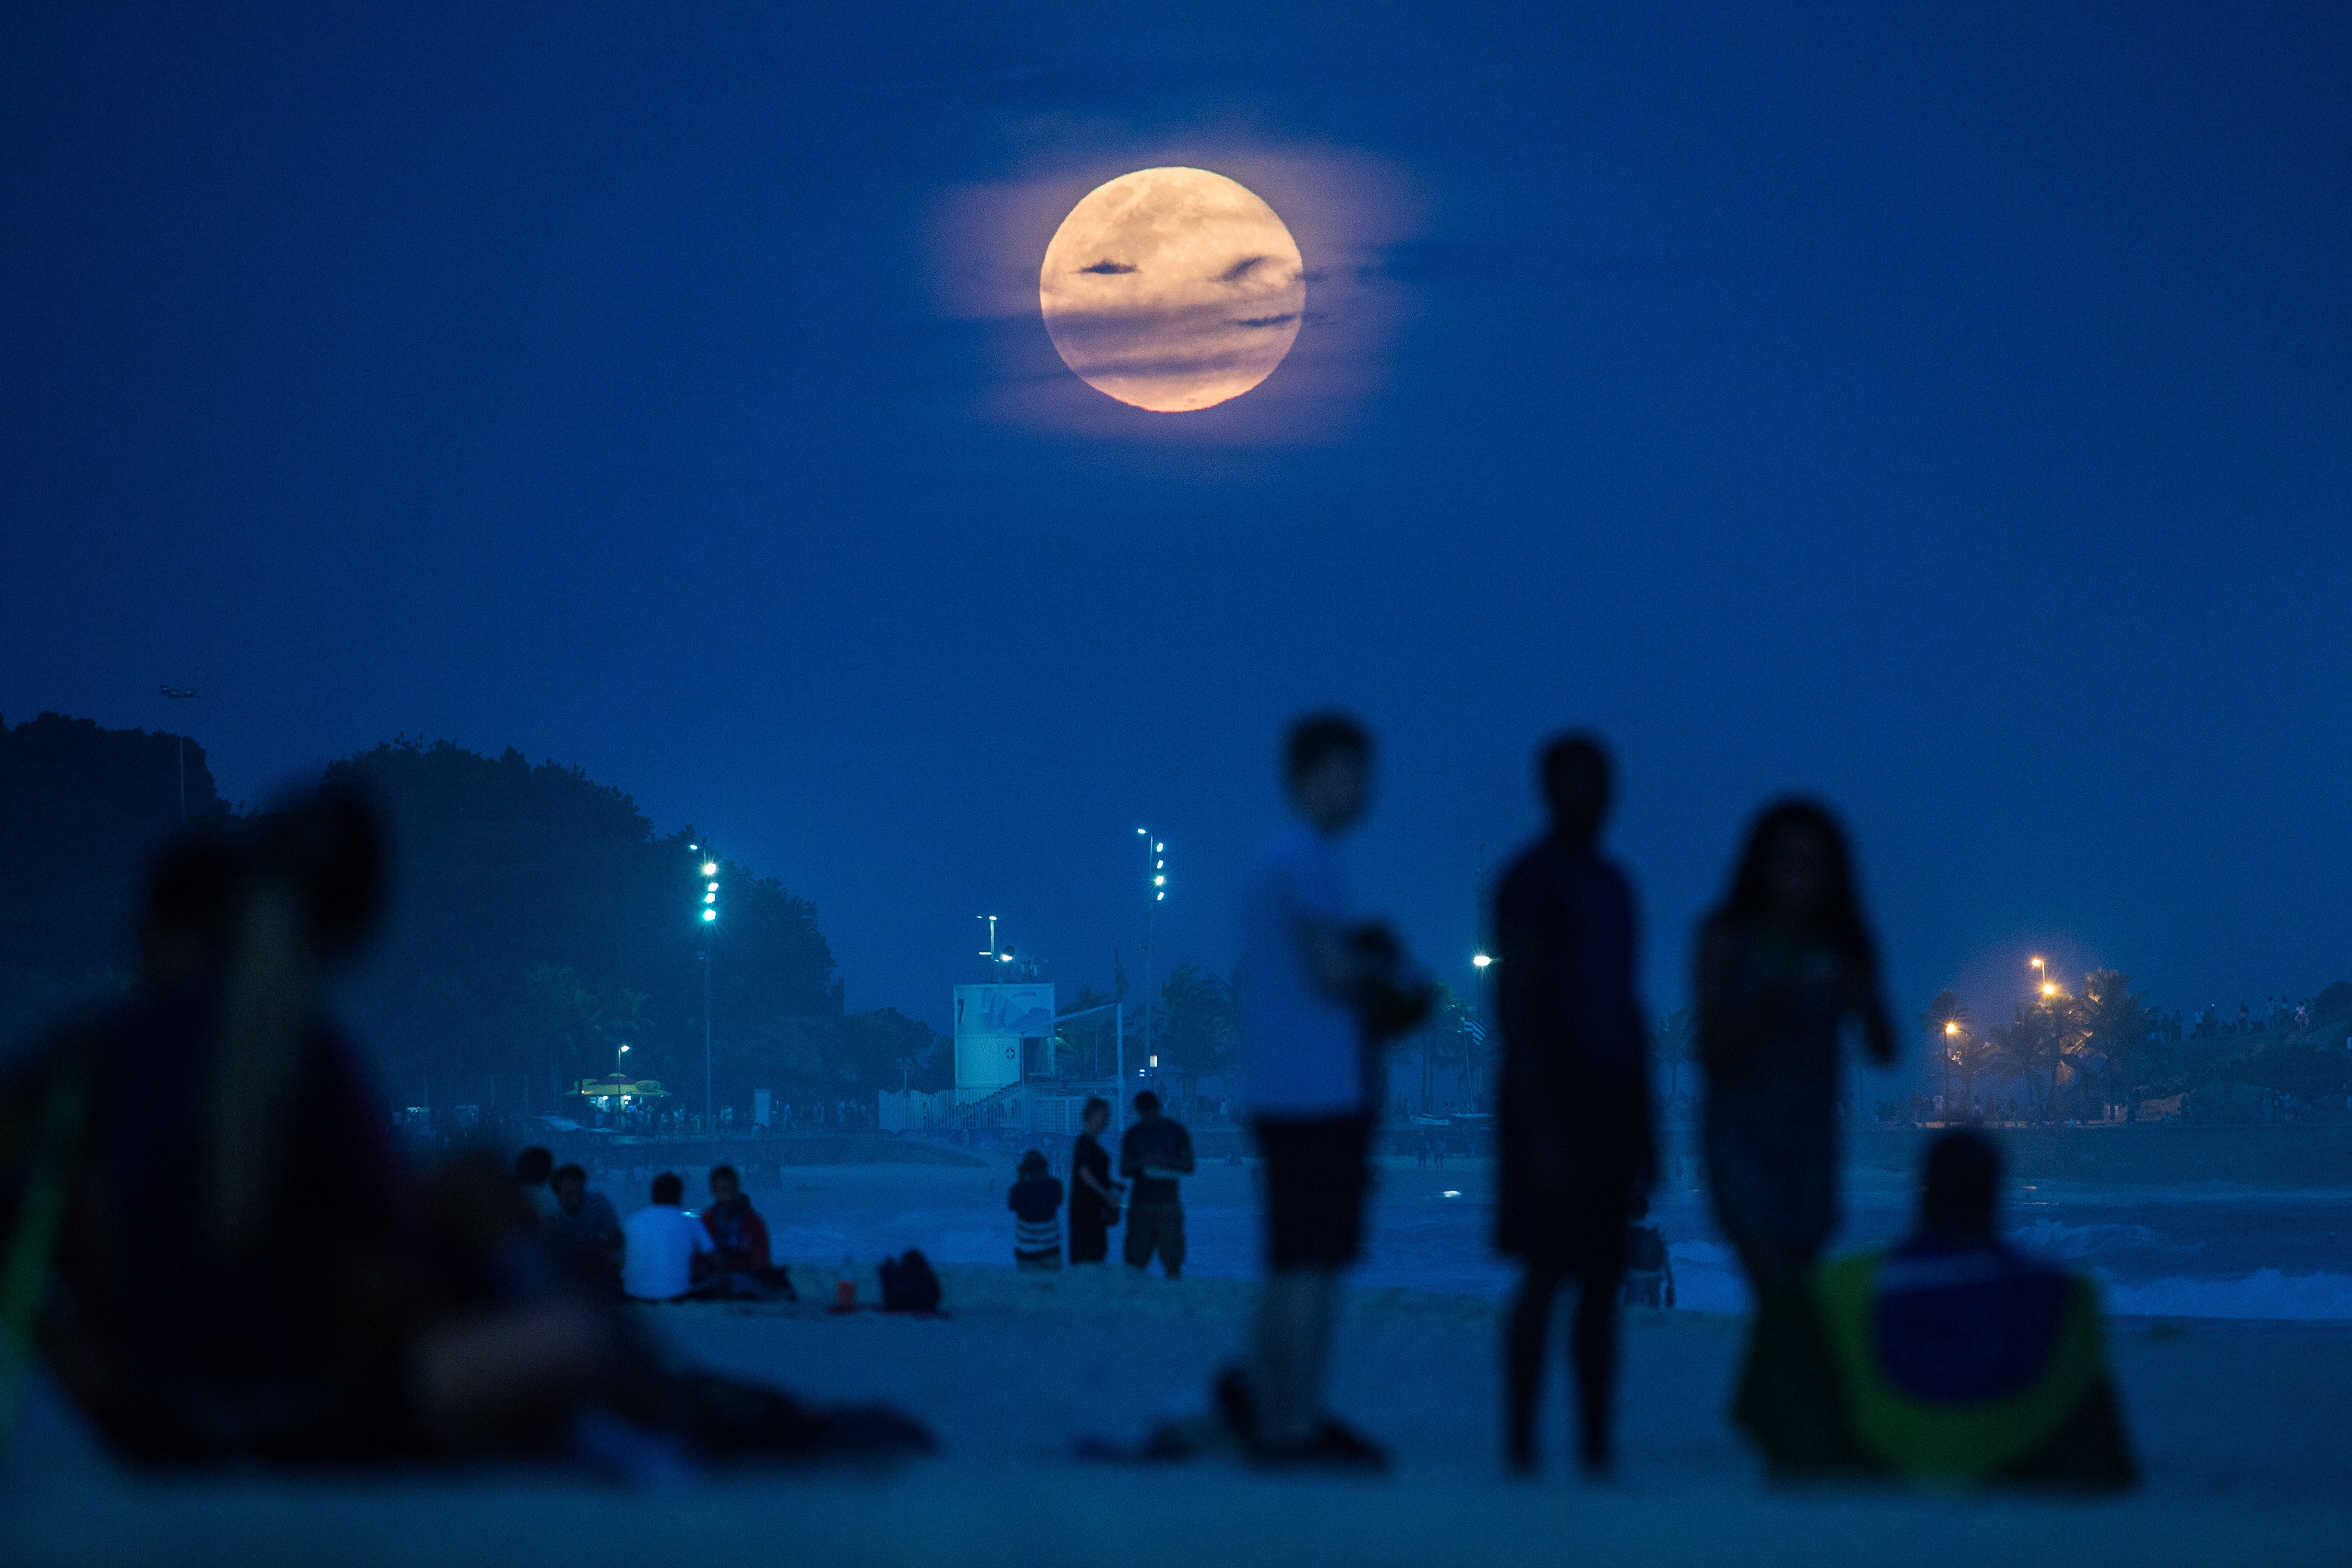 The supermoon rises at Ipanema beach in Rio de Janeiro on Aug. 10, 2014.